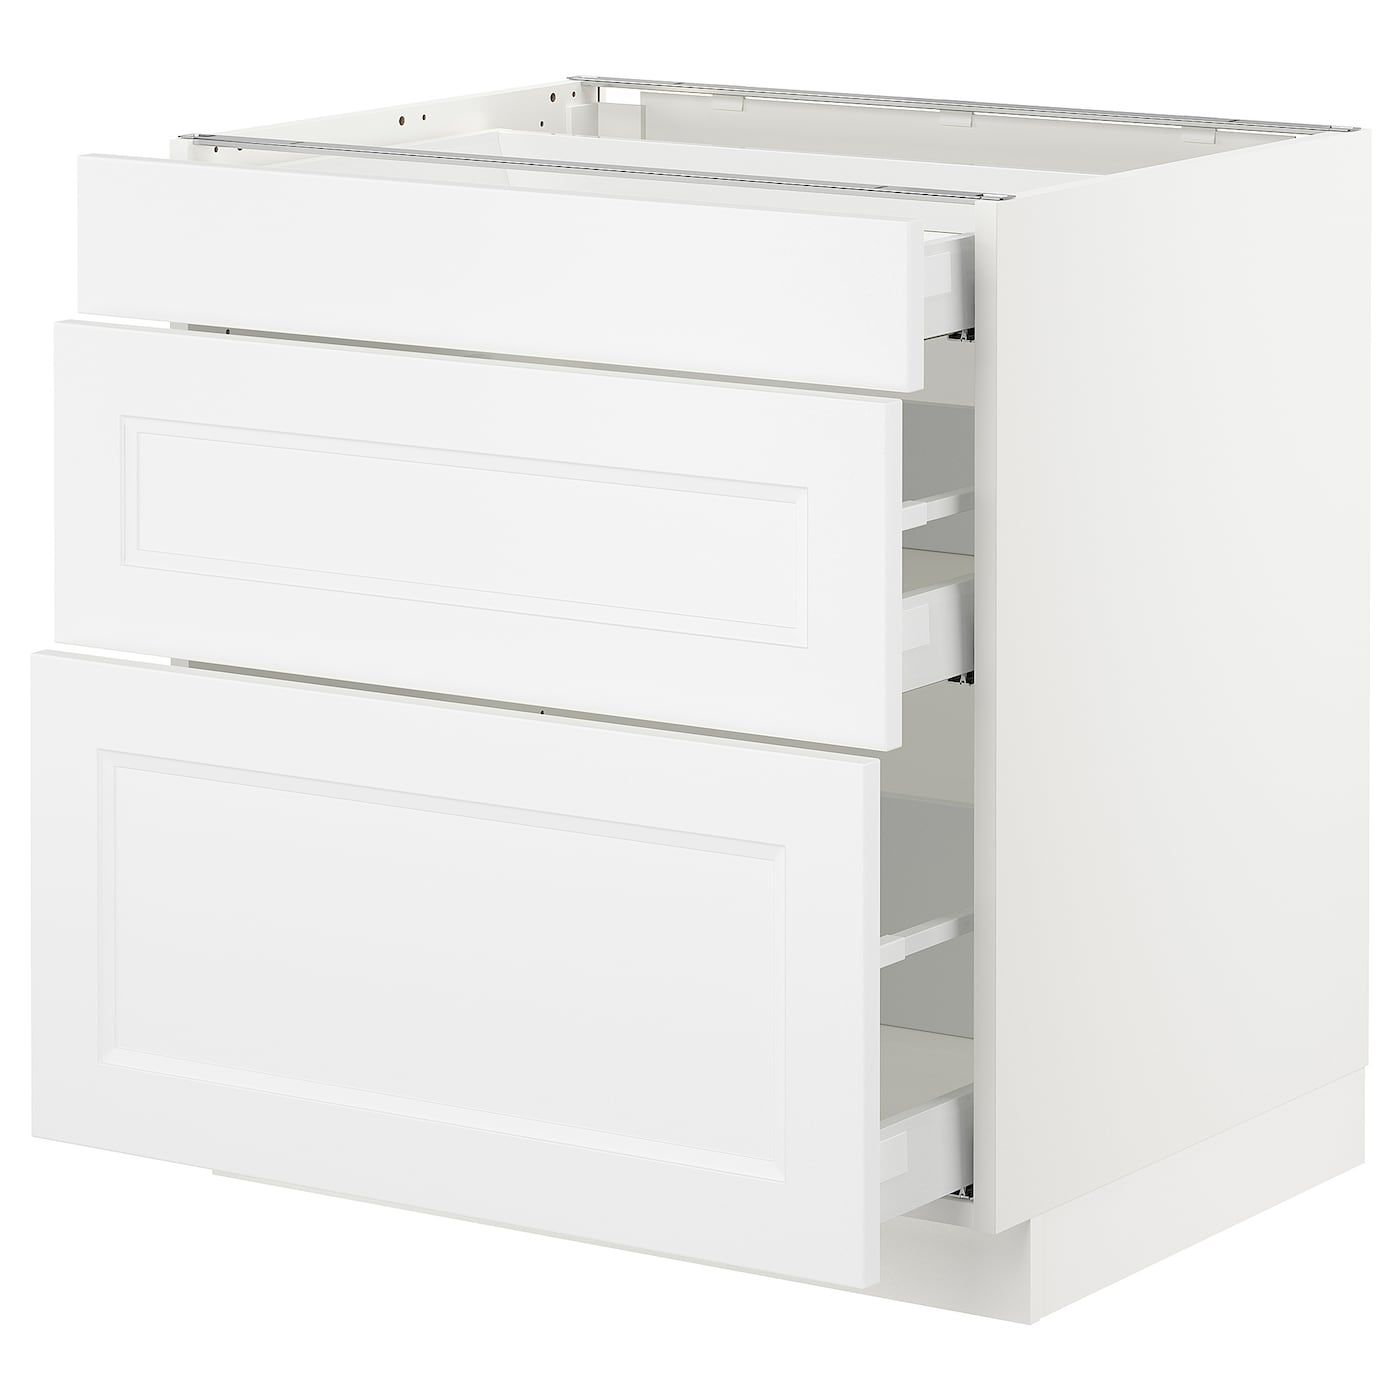 Sektion Base Cabinet With 3 Drawers White Maximera Axstad Matt White 30x24x30 Ikea Base Cabinets Ikea Drawers